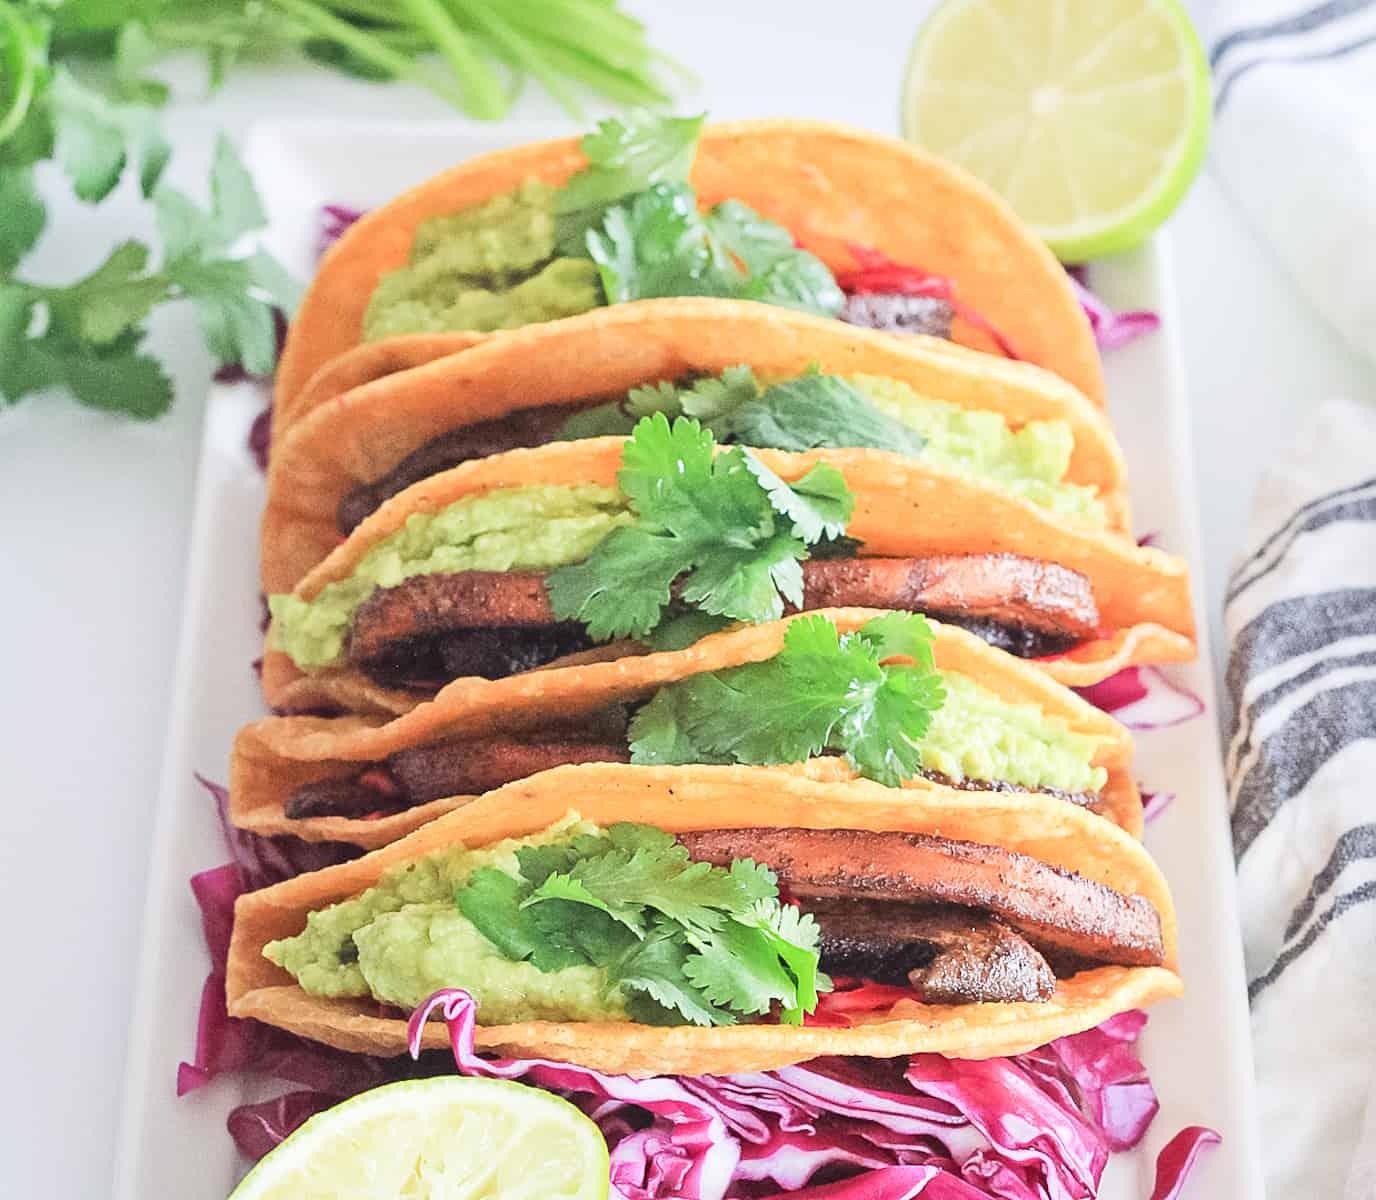 White platter of veggie mushroom tacos in a corn tortilla with guacamole, cabbage and cilantro.